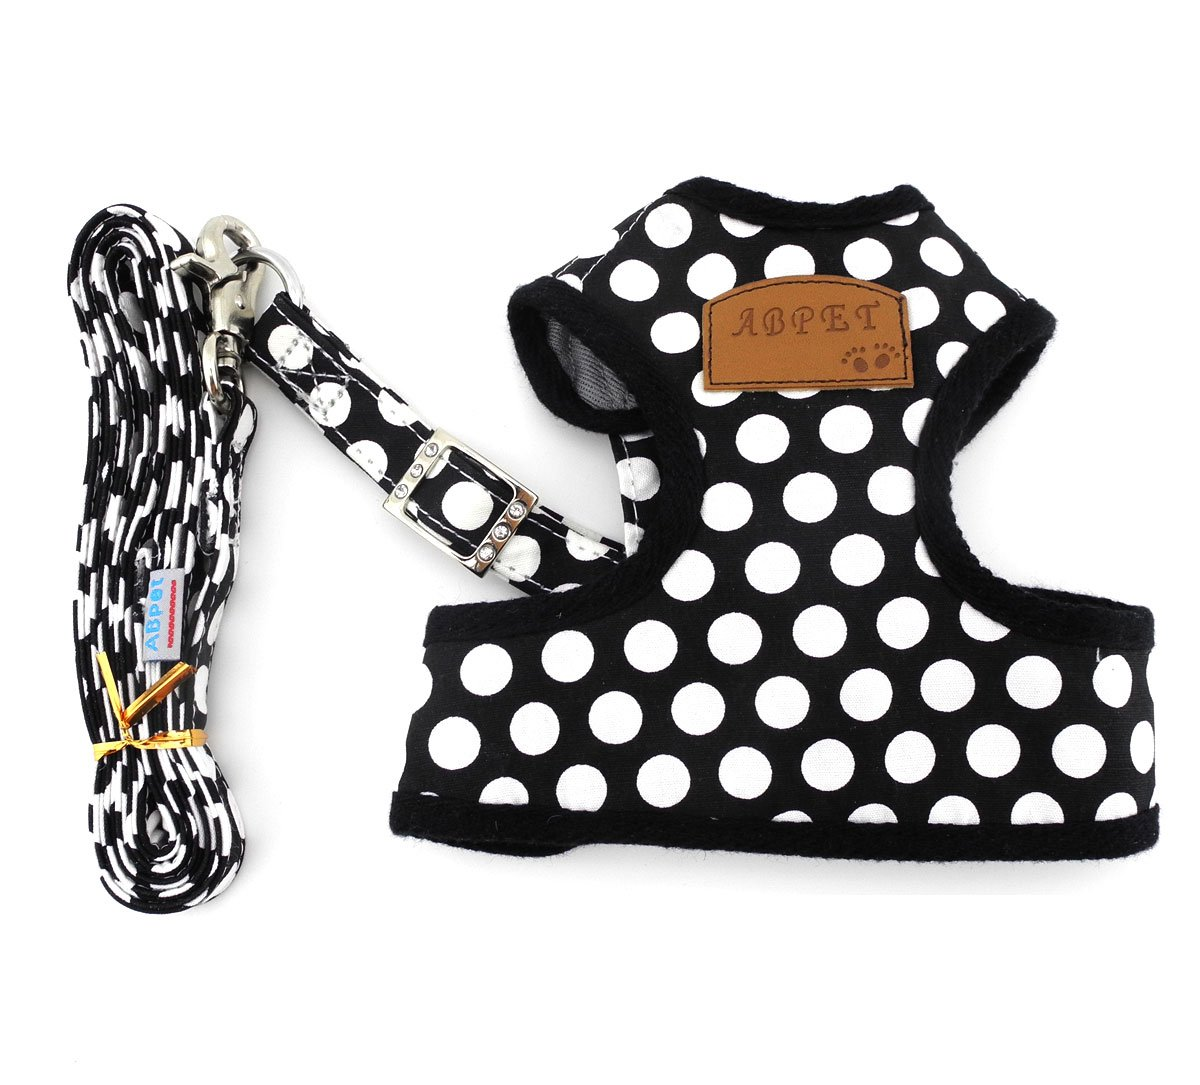 SMALLLEE_LUCKY_STORE New Soft Mesh Nylon Vest Pet Cat Small Medium Dog Harness Dog Leash Set Leads Black M